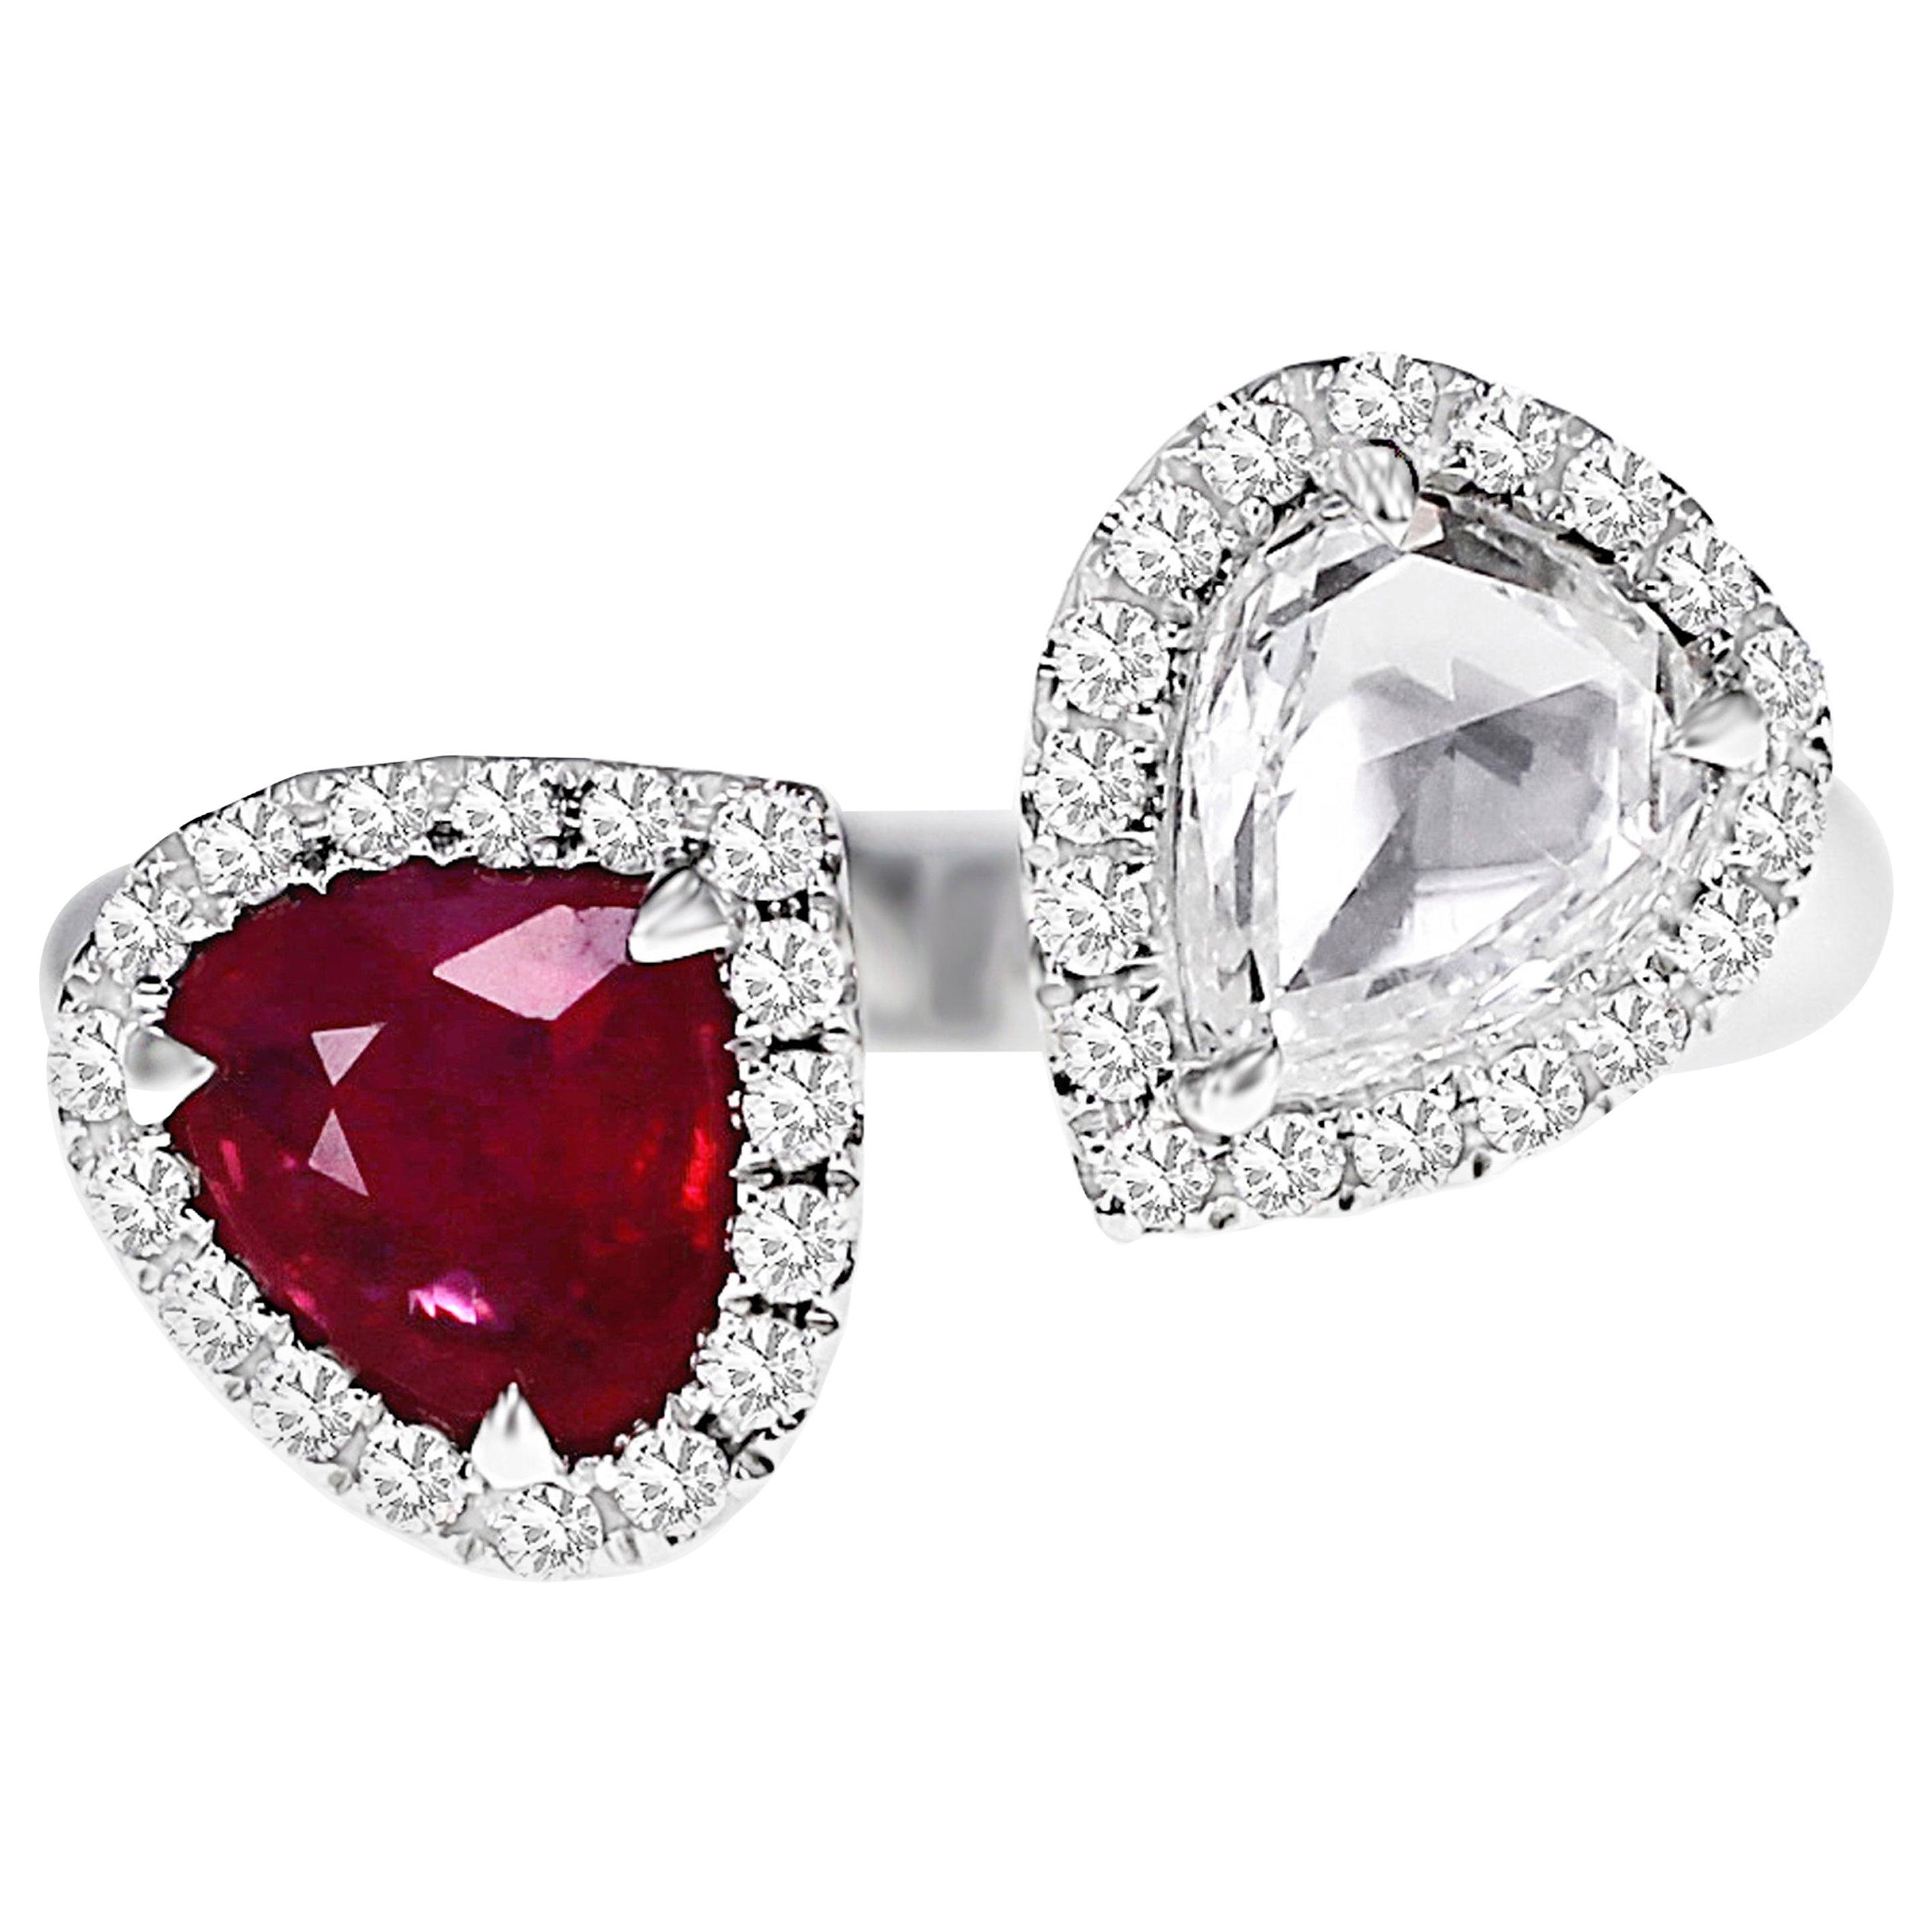 1.03 Carat Vivid Red Ruby and 1 Carat Diamond Twin Ring